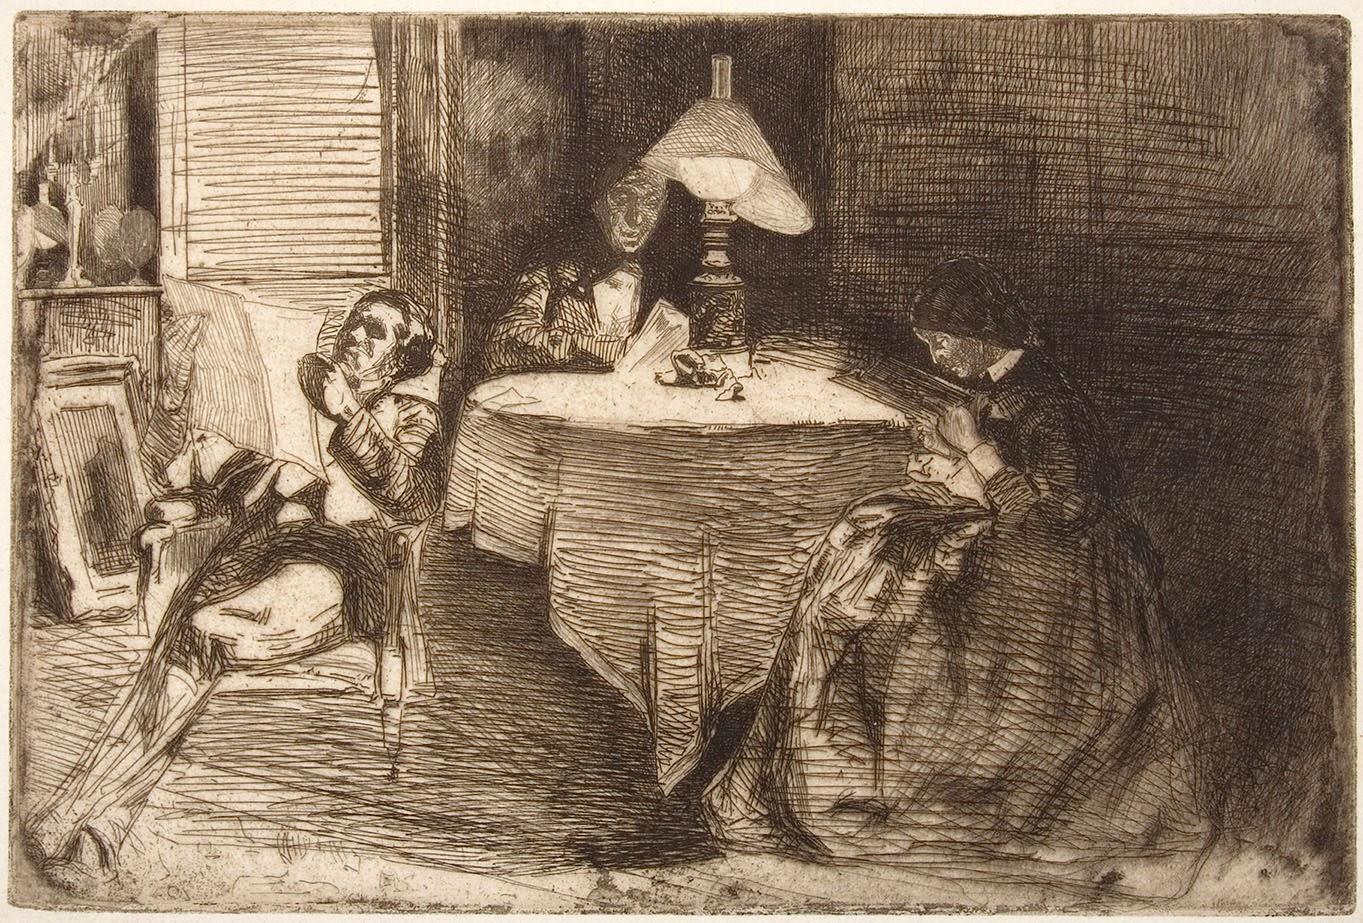 James McNeill Whistler, La sala de música